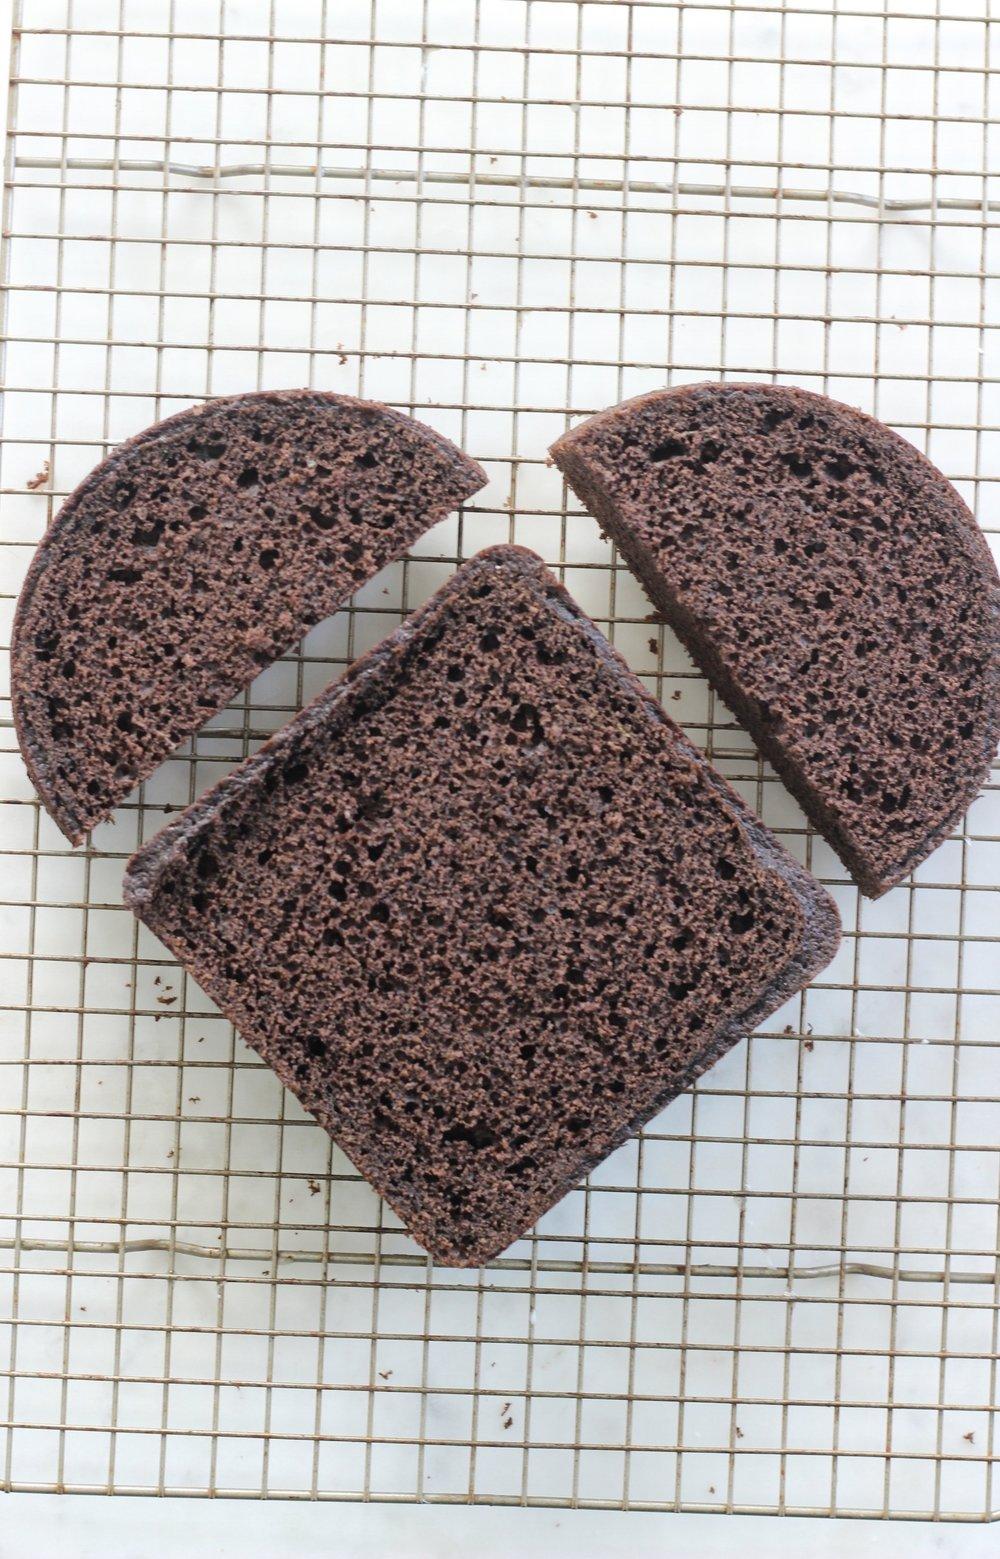 Heart Shaped Cake Tutorial